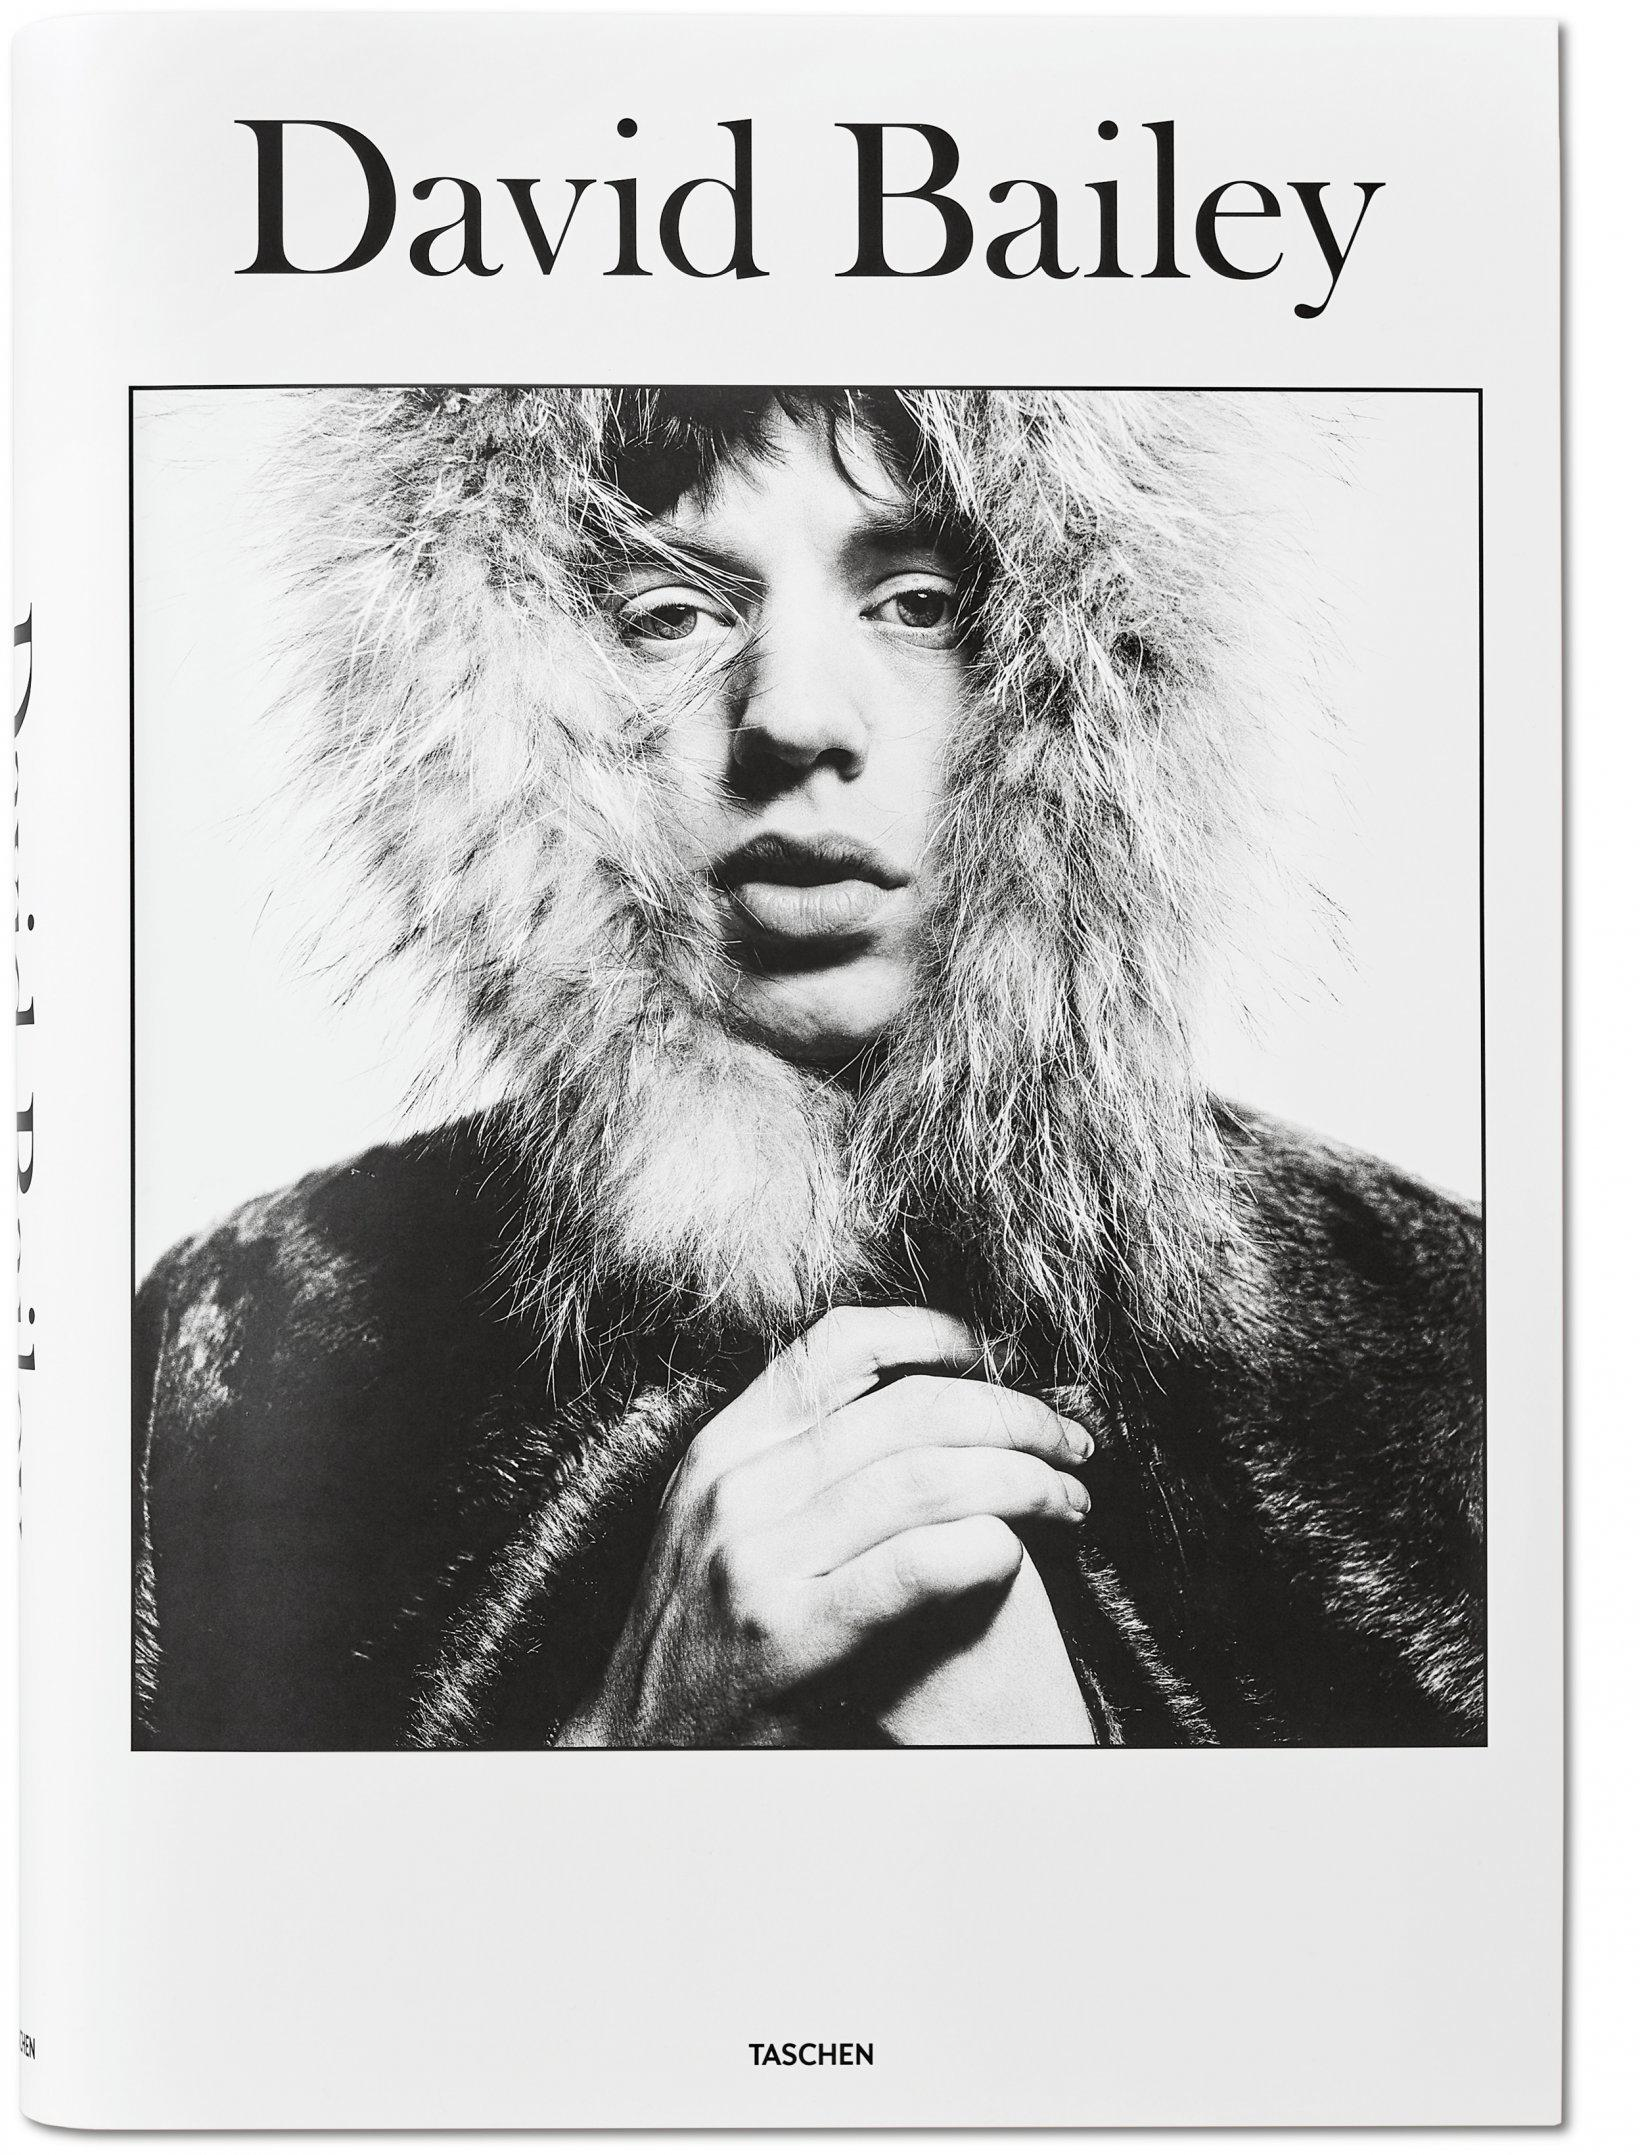 David Bailey Art Edition Mick Jagger Variant